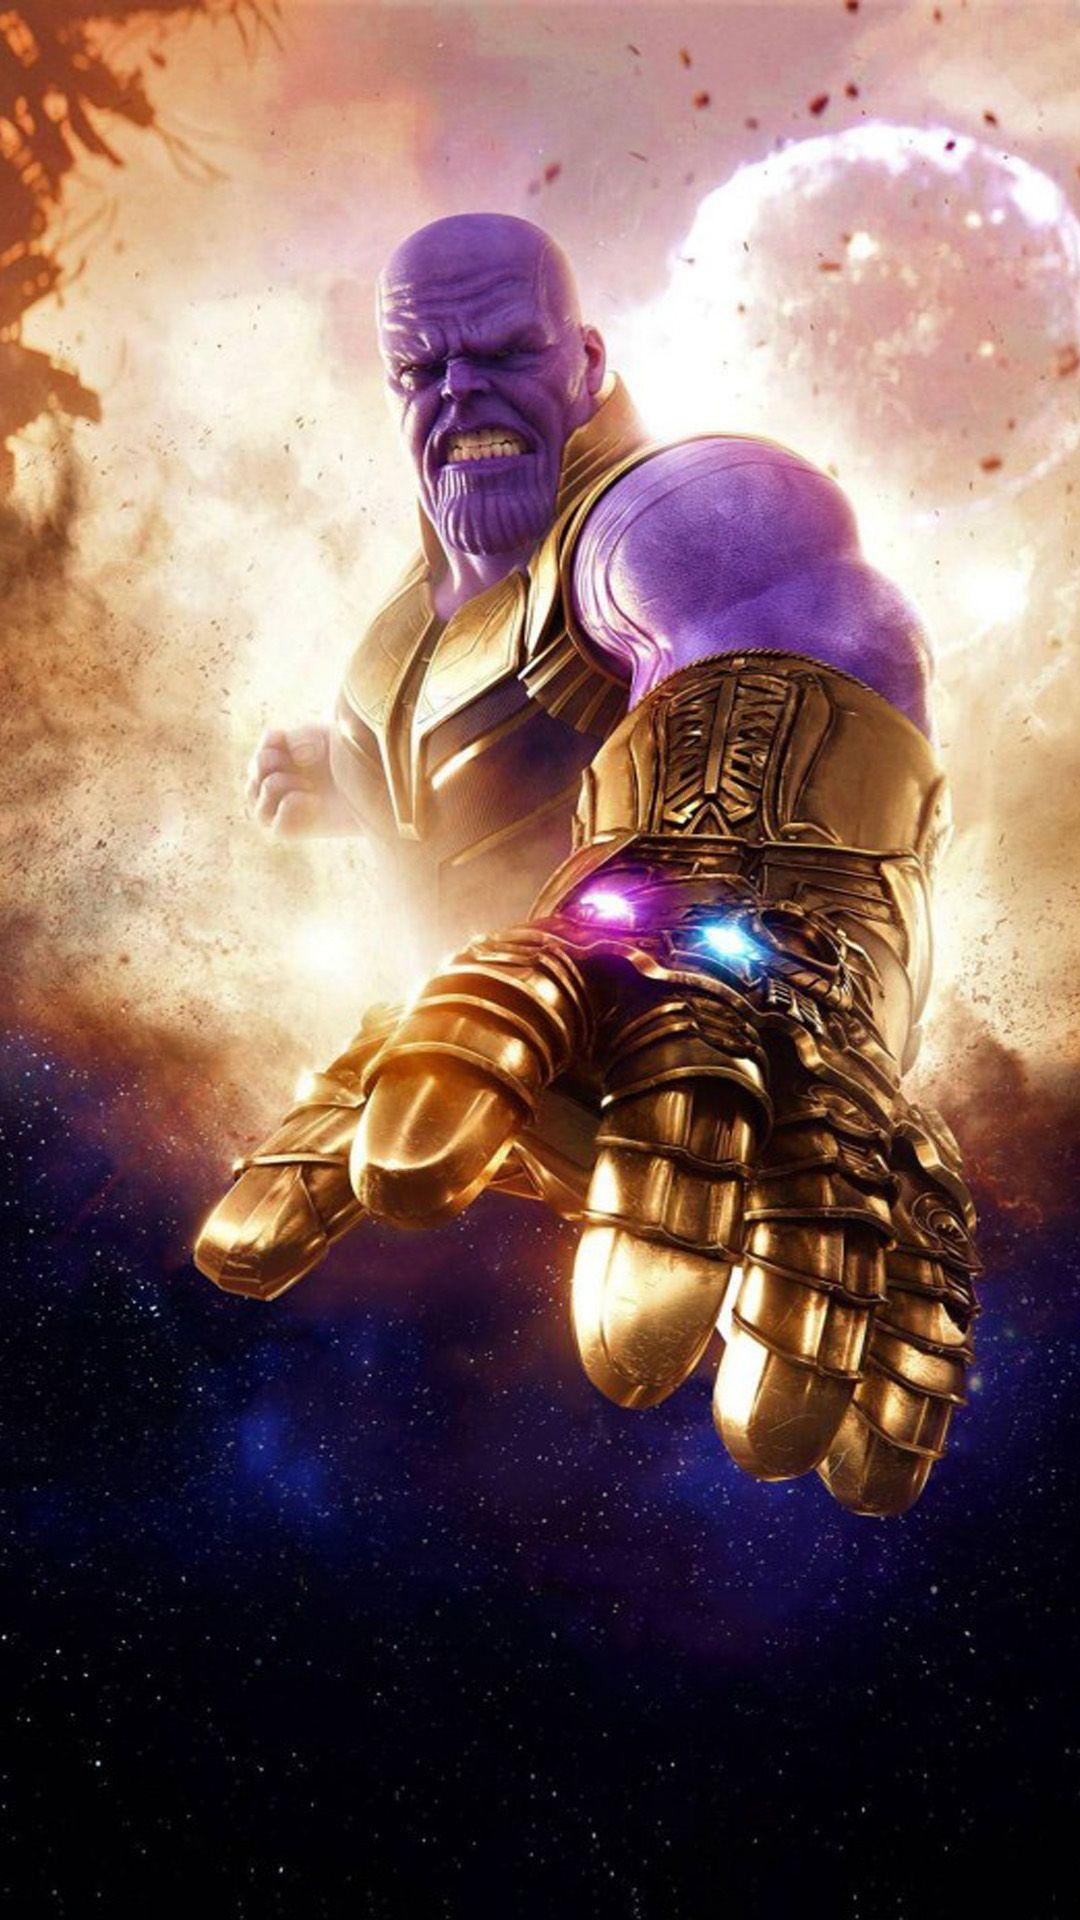 Thanos Avengers Infinity War 2018 Marvel vingadores Viles da 1080x1920